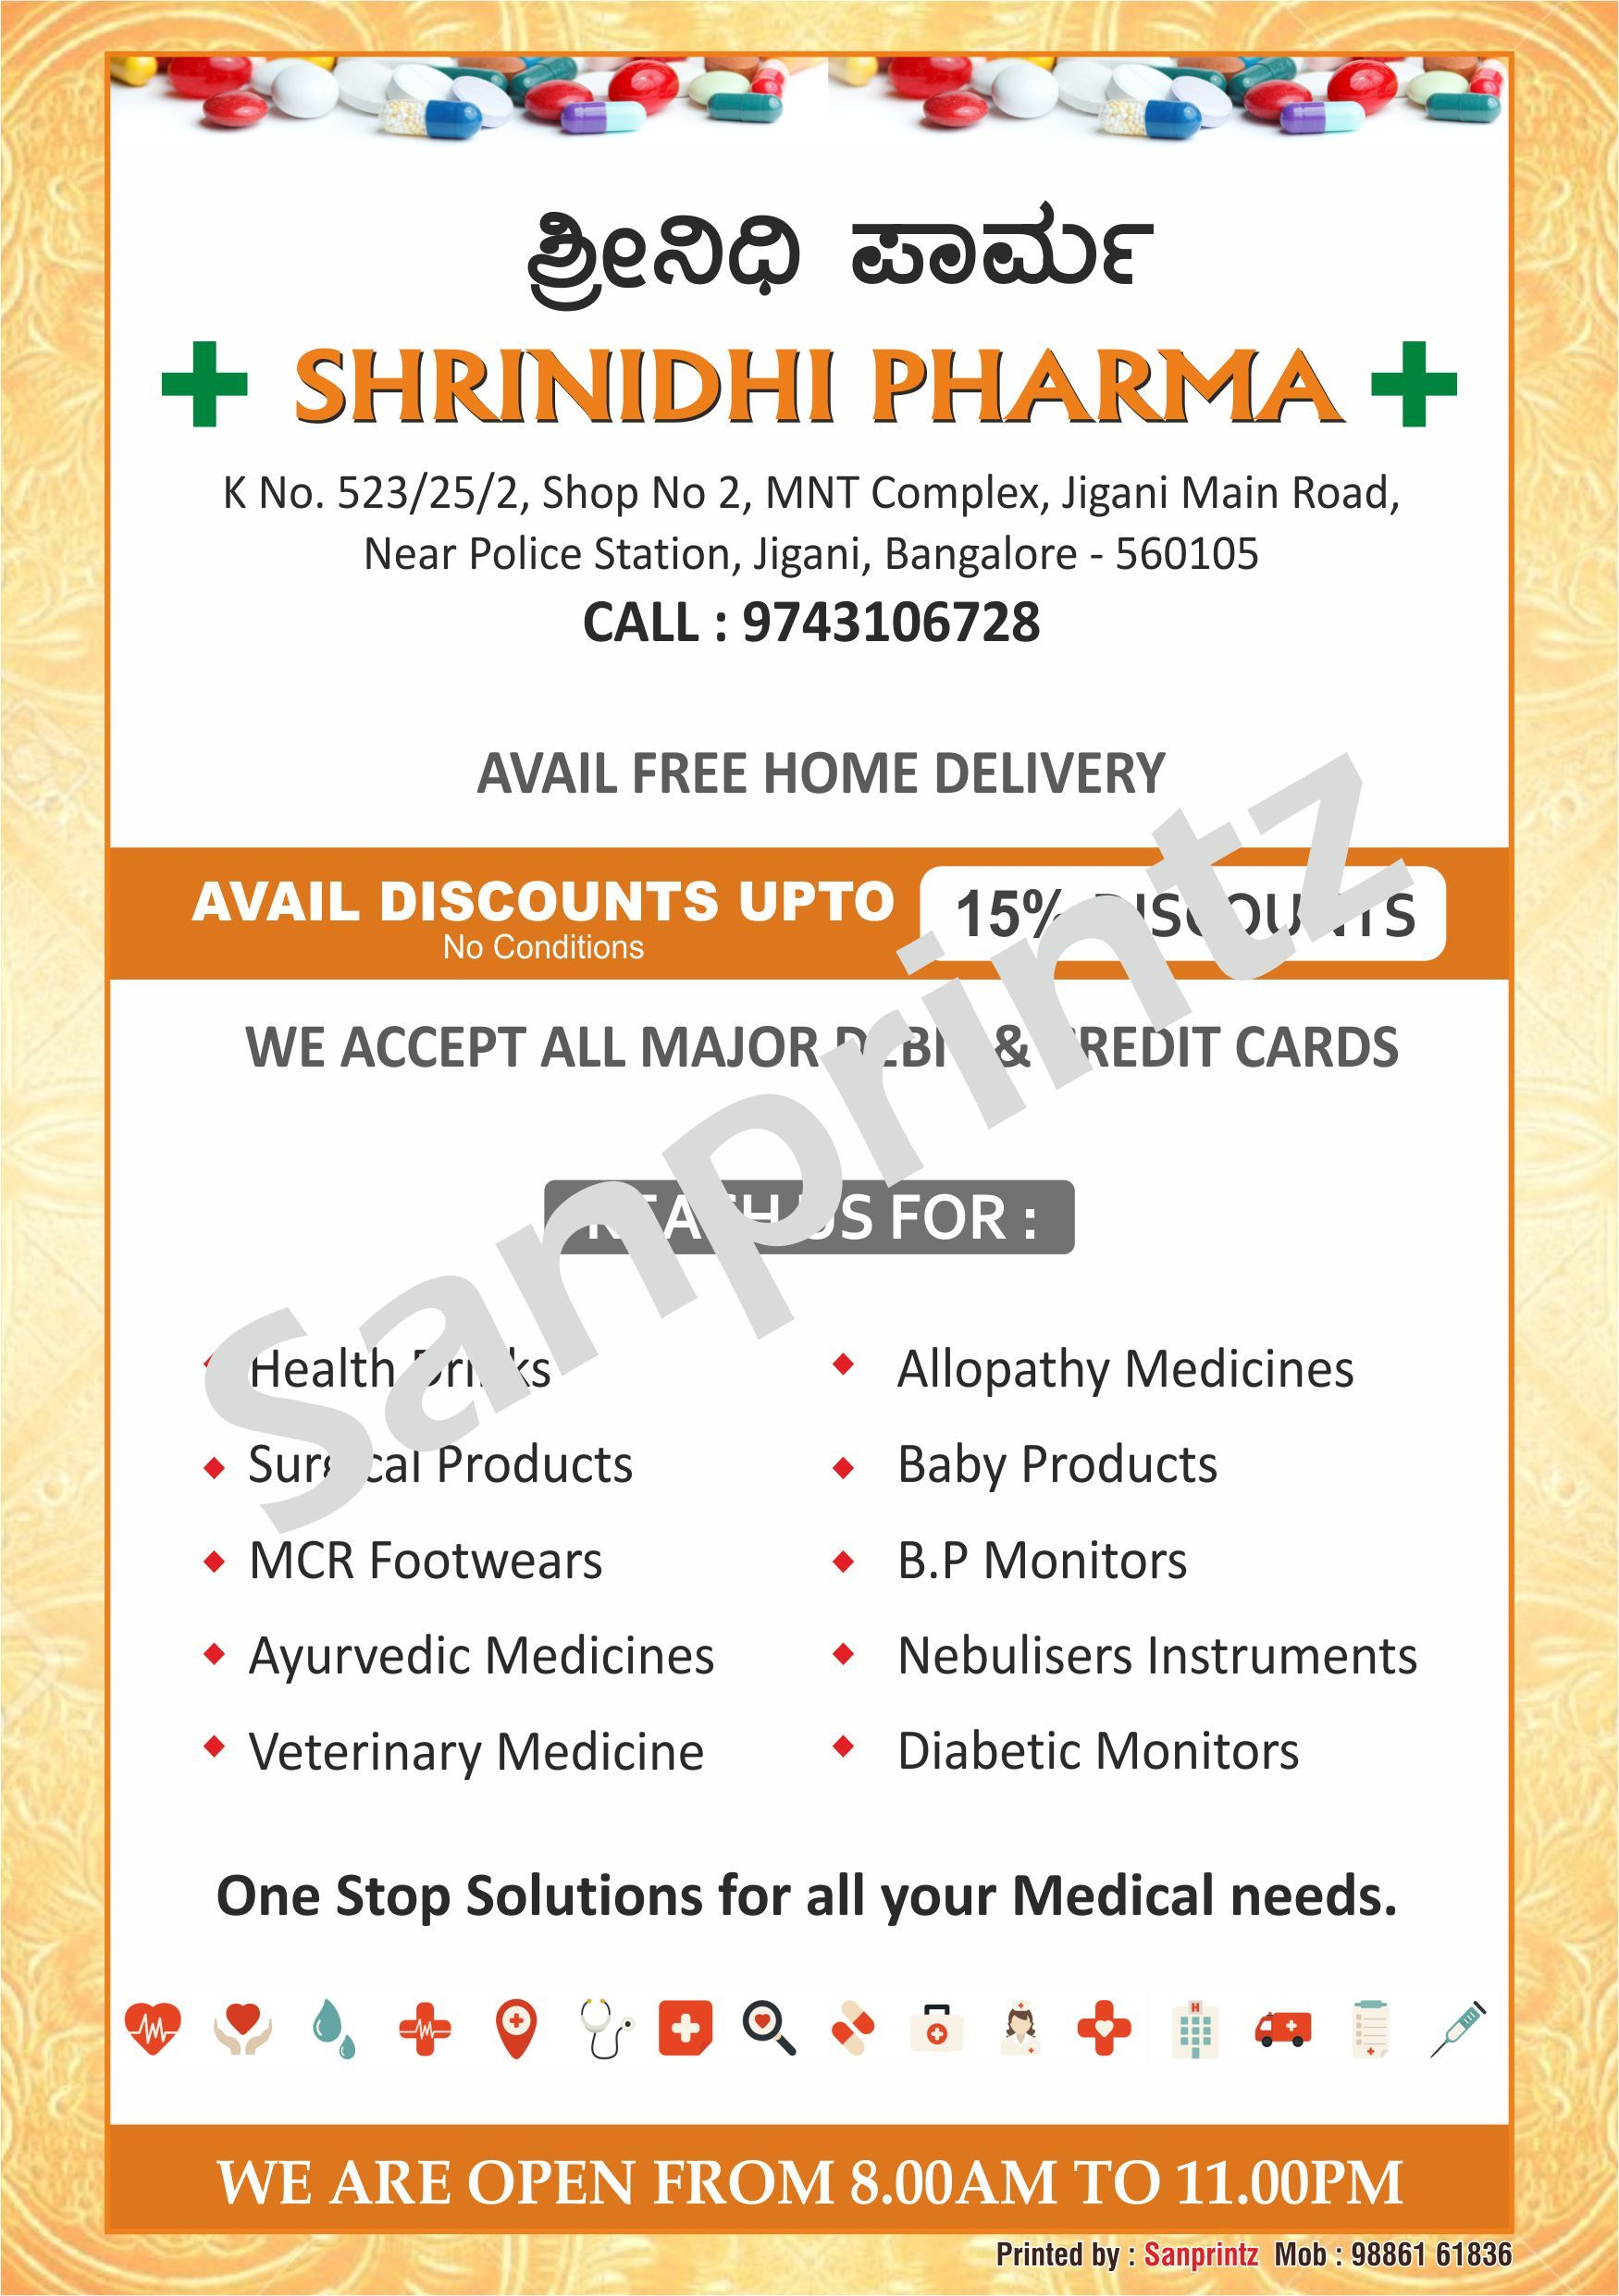 pharma sanprintz arihanthmarketing medical pamphlet leaflet